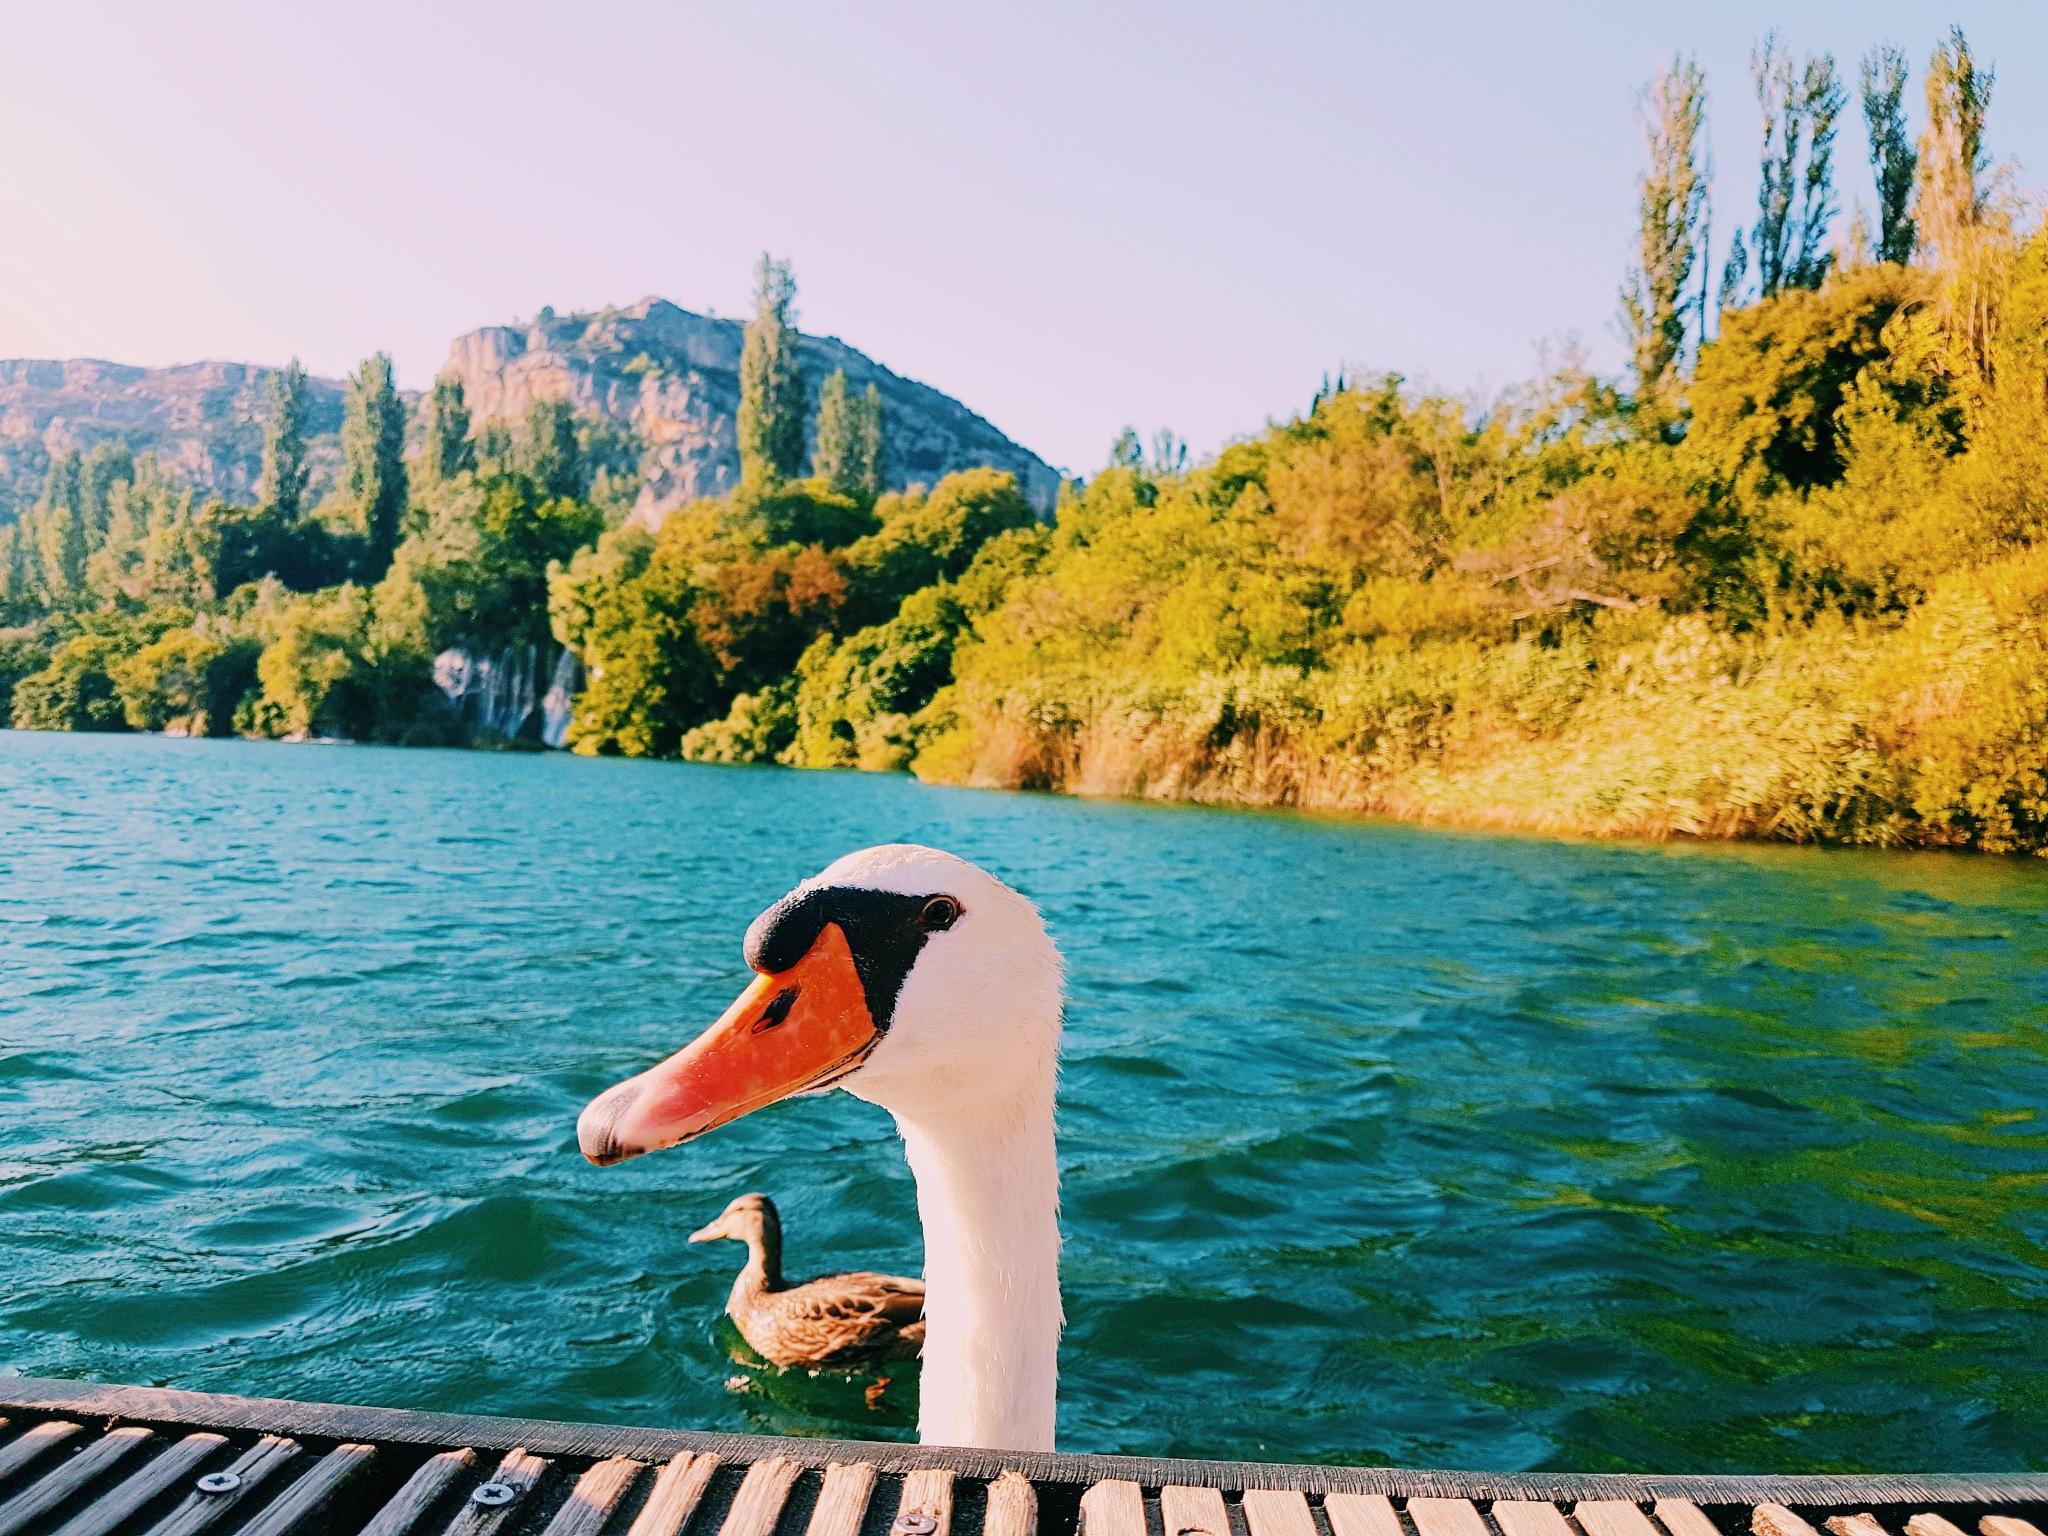 Untitled by Federica_ottone